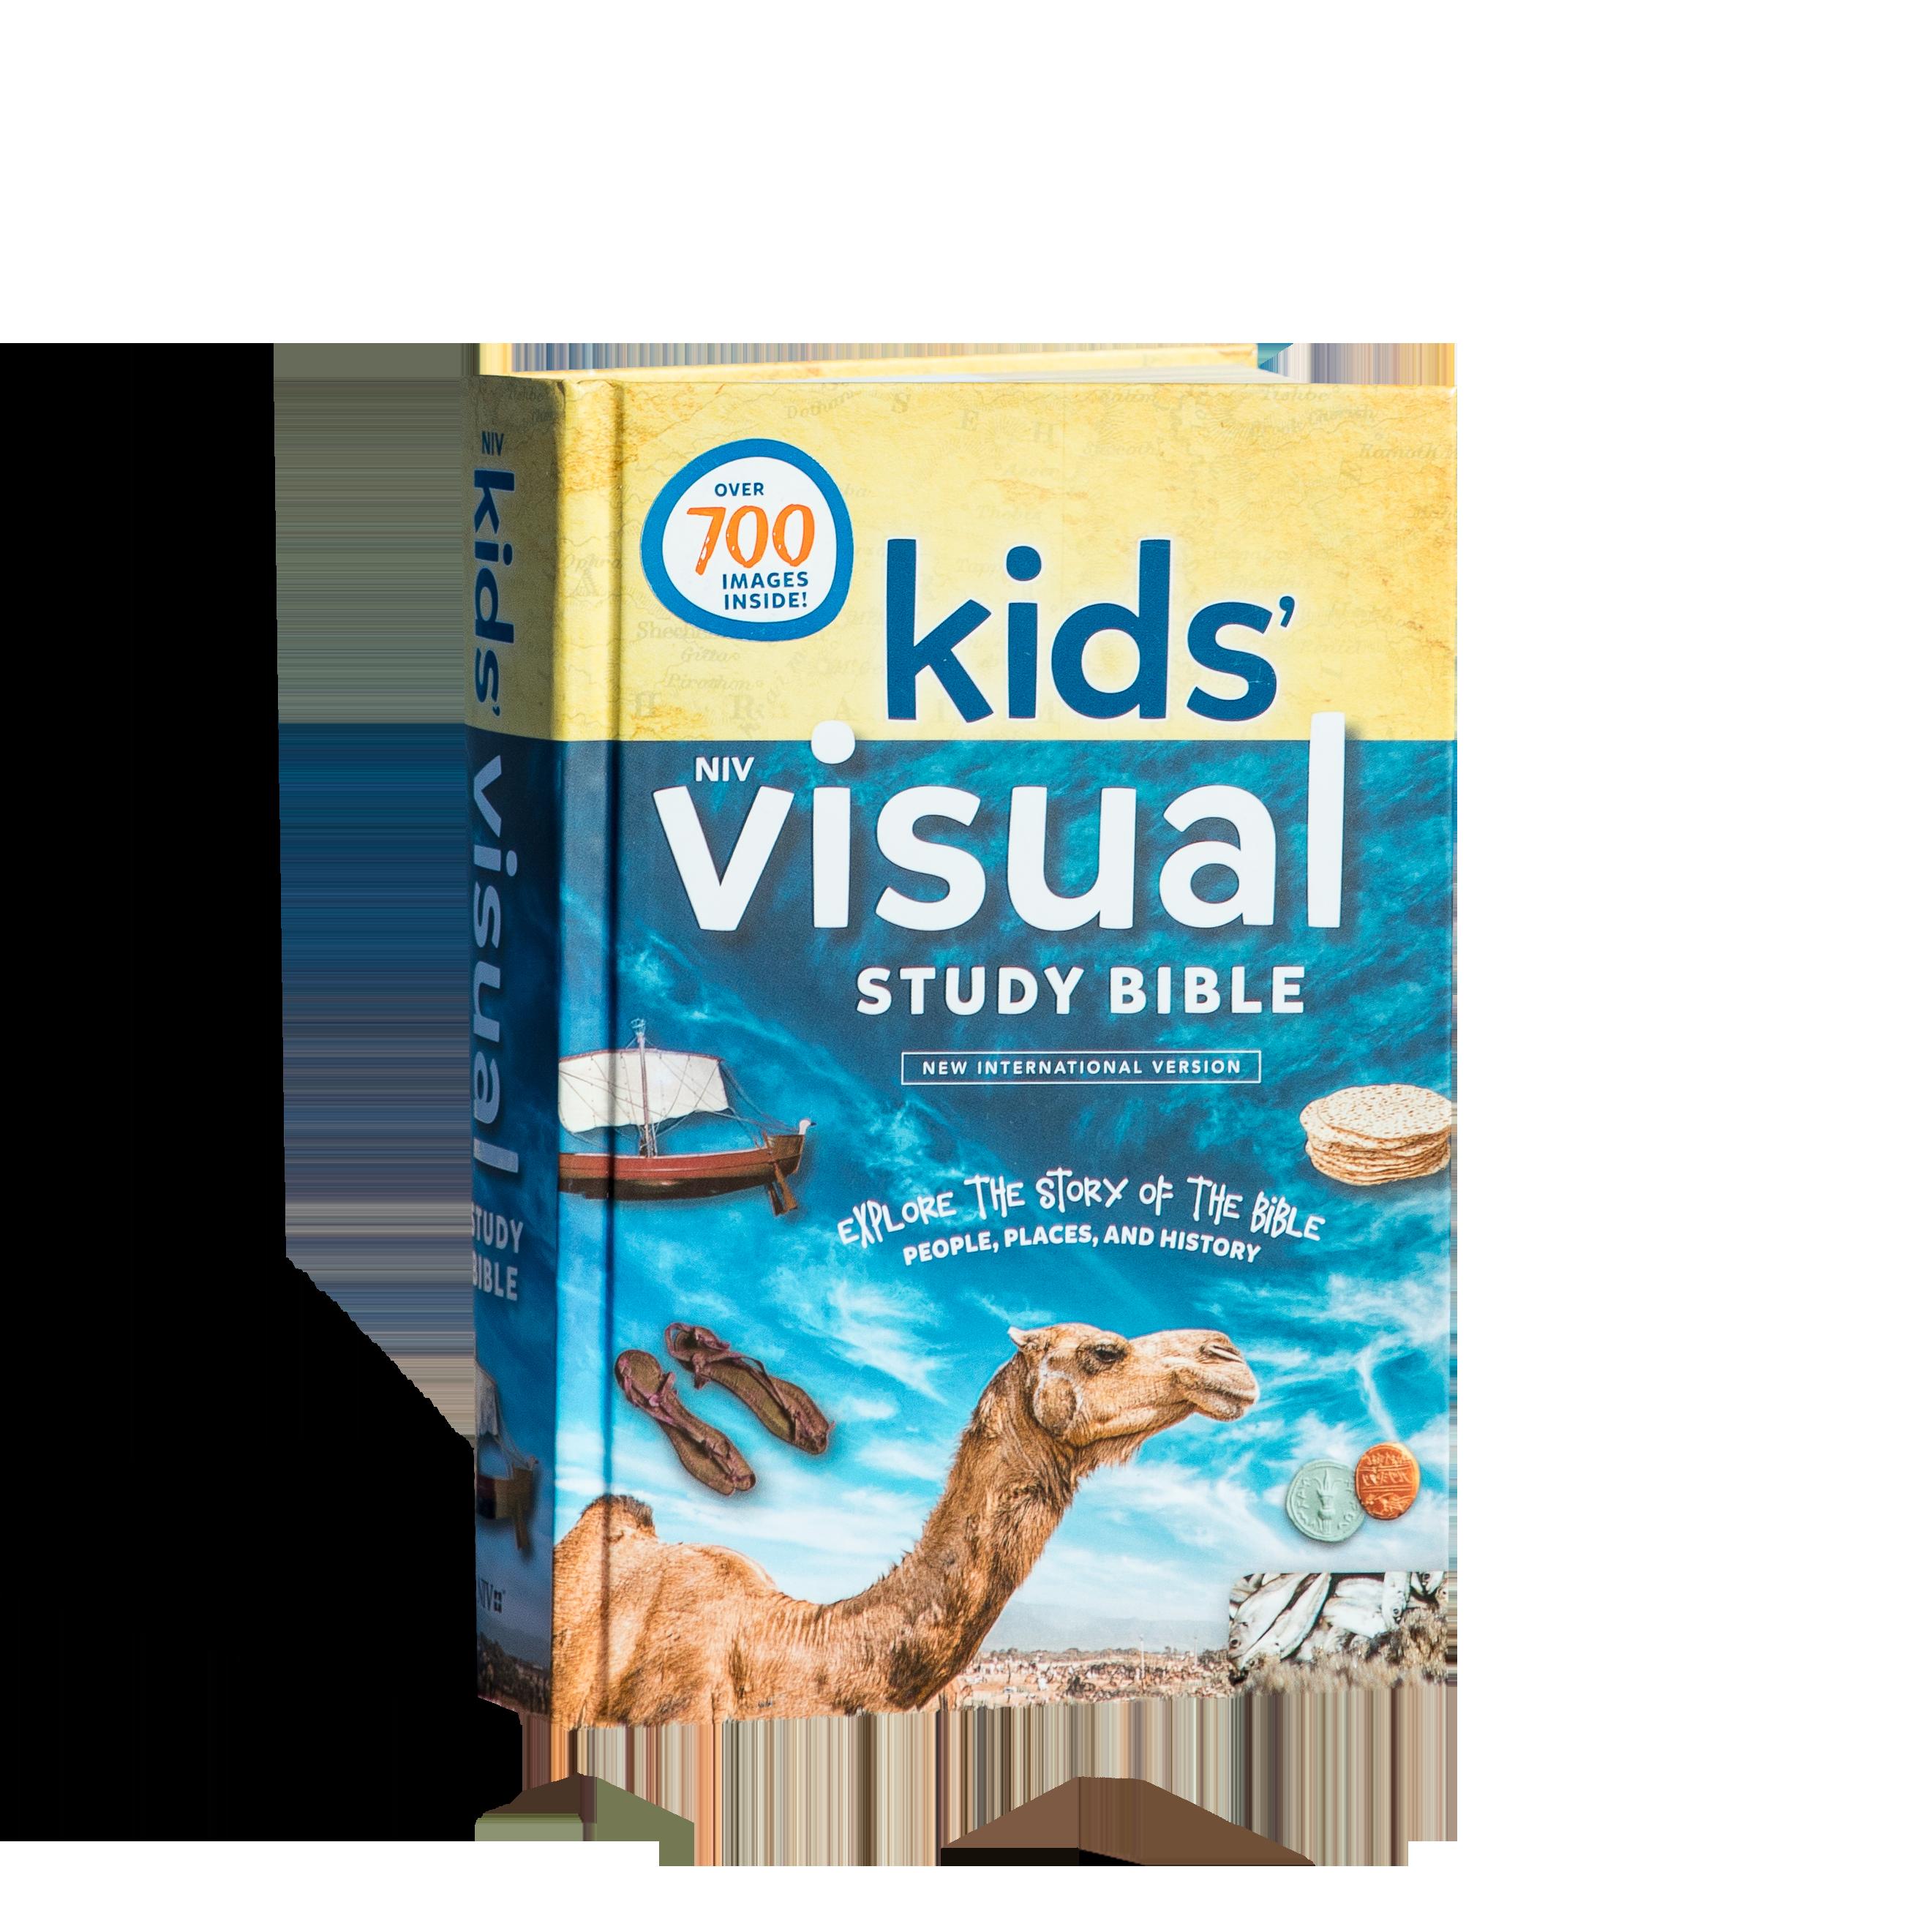 KidsVisual_HC_9780310758600